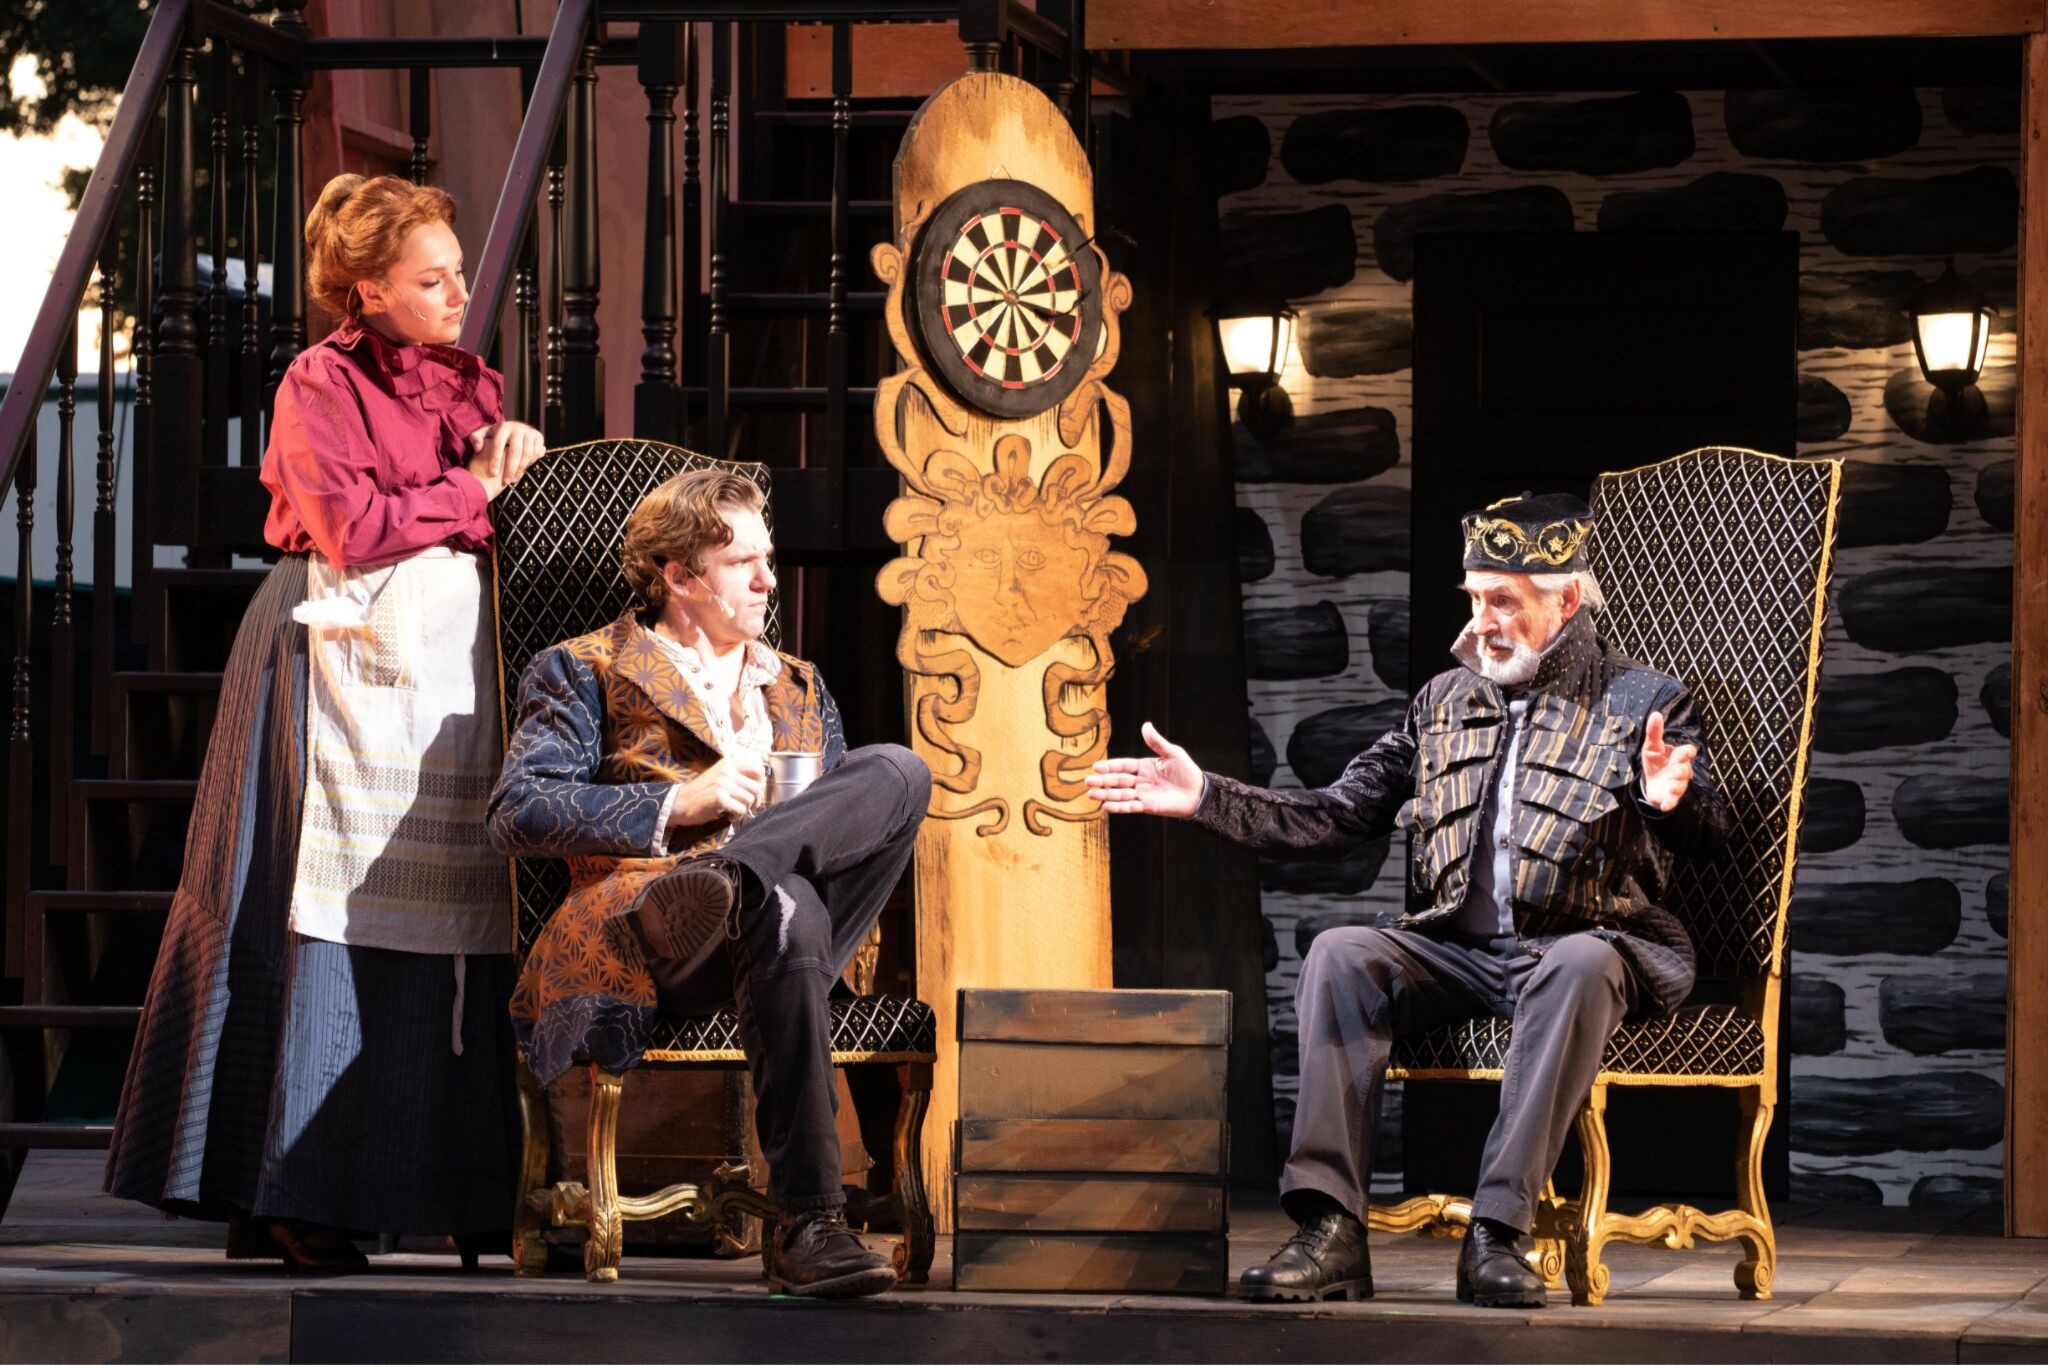 Sarah Vasilevsky (Lady), Richard Noble (Philario), and Jesse Hinson (Iachimo) in Cymbeline, Shakespeare on the Common 2019-Photo by Evgenia Eliseeva